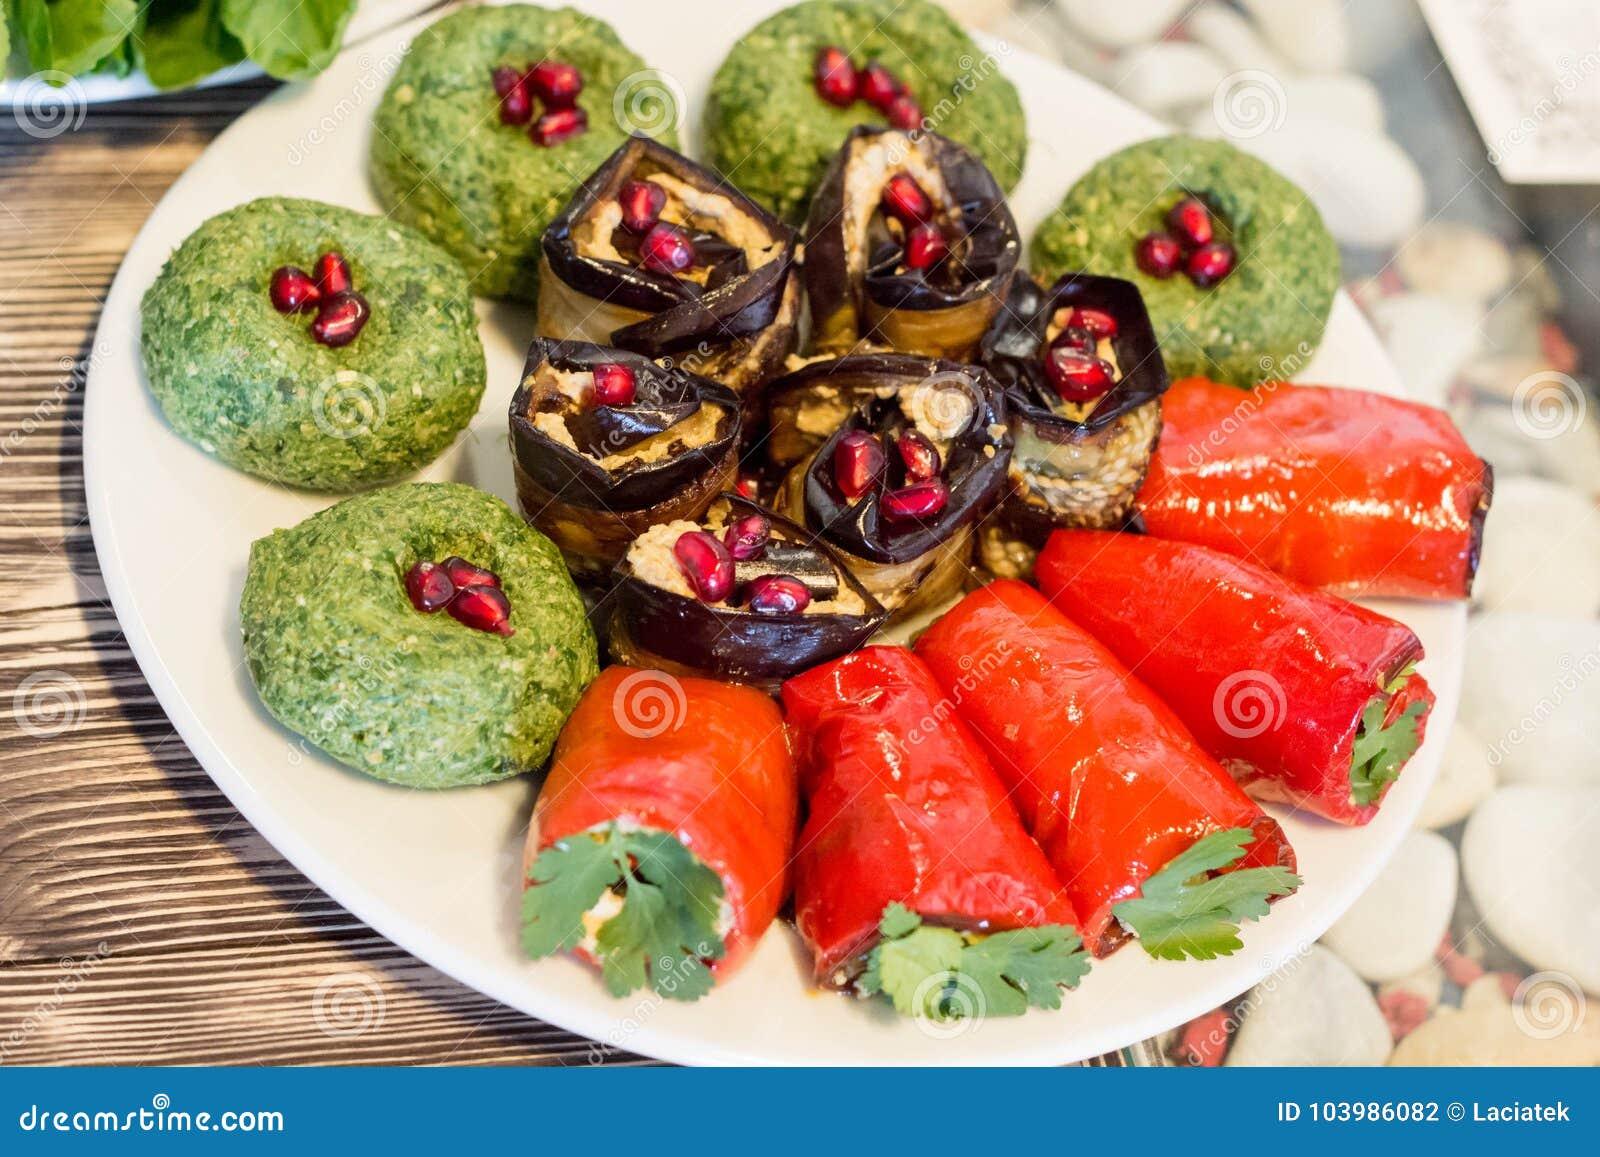 Traditional georgian food : Badridżani and stuffed vegetables